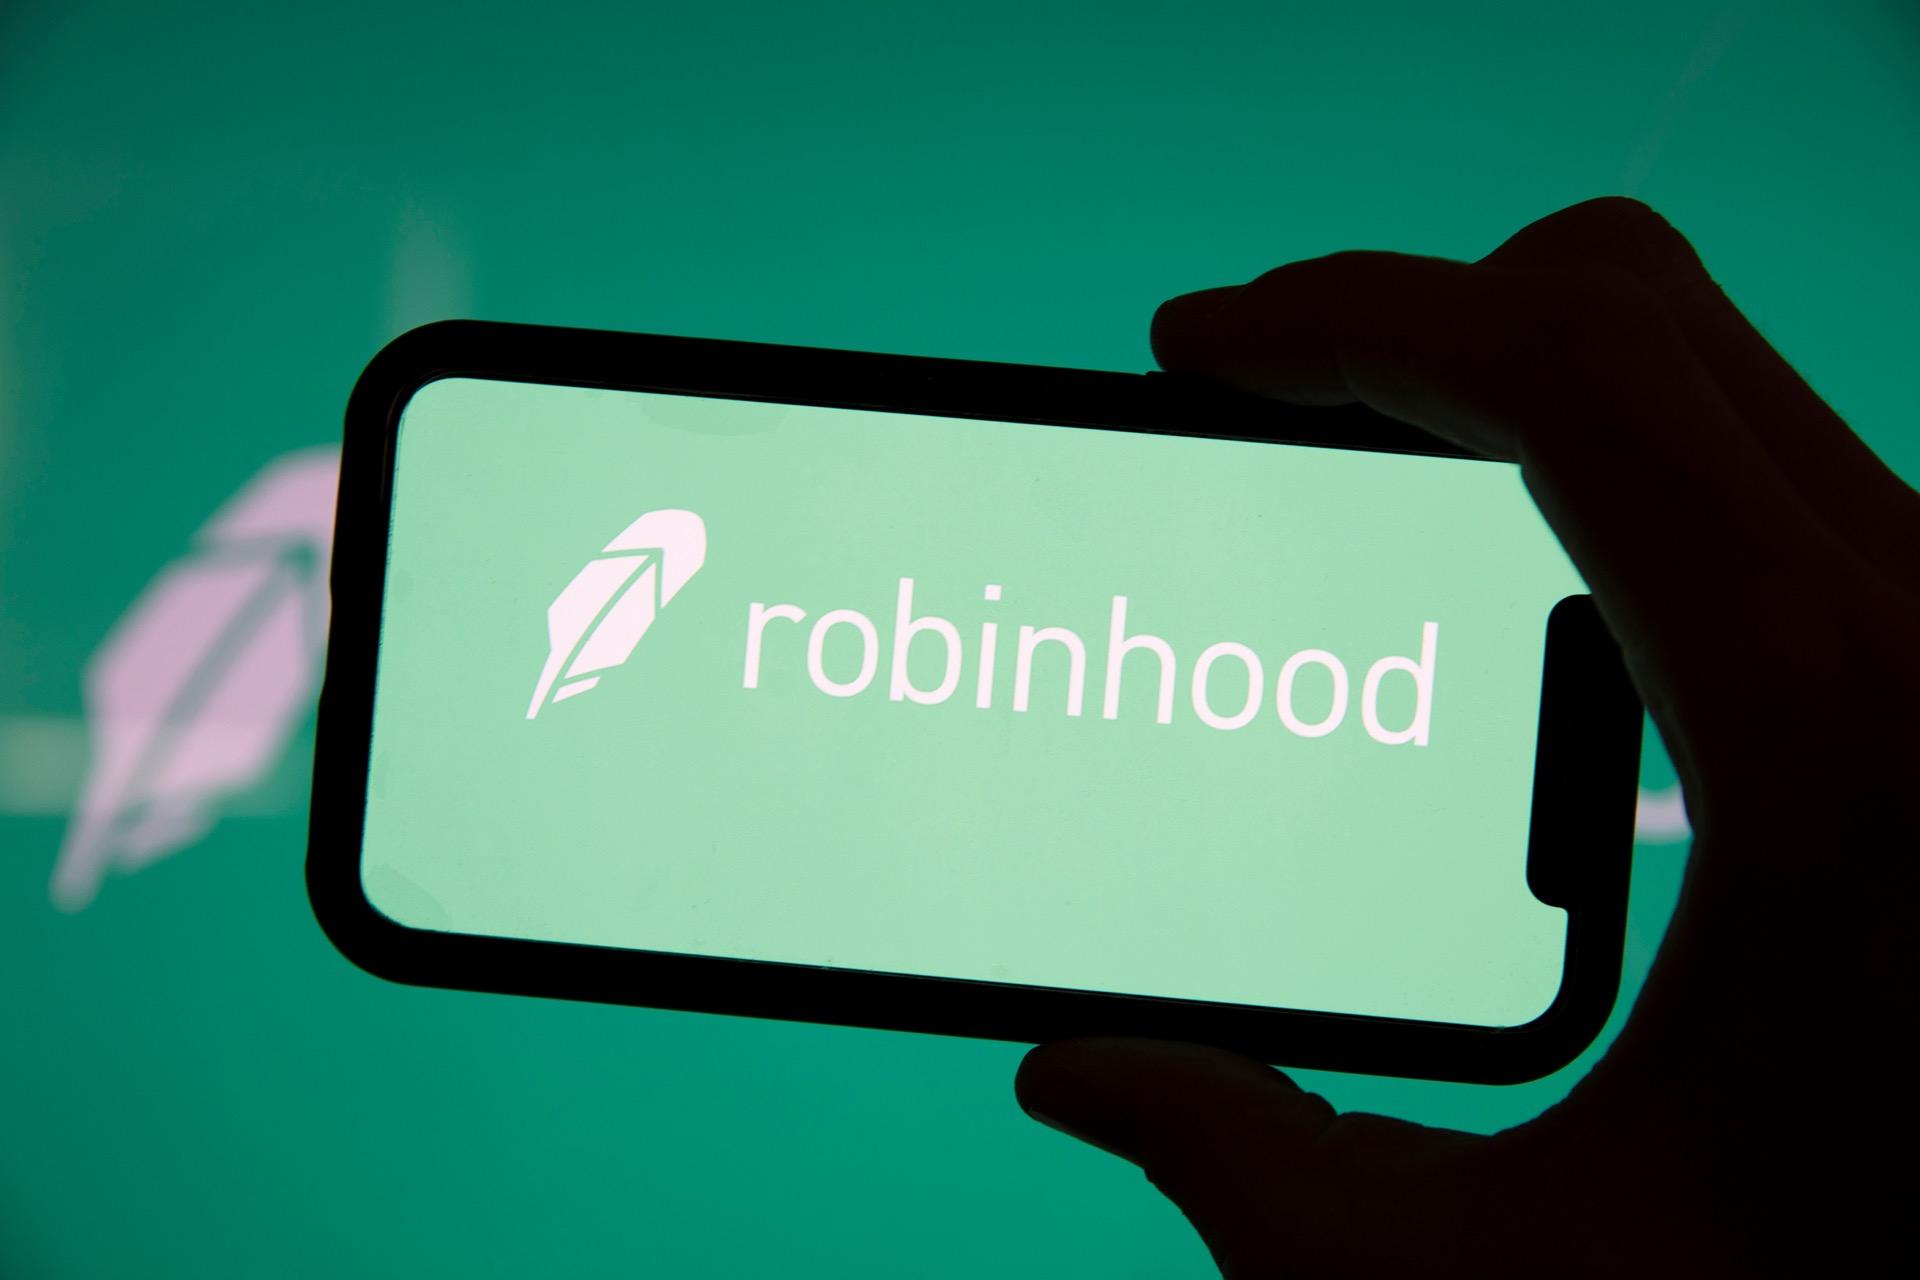 Robinhood files for non-public public offering